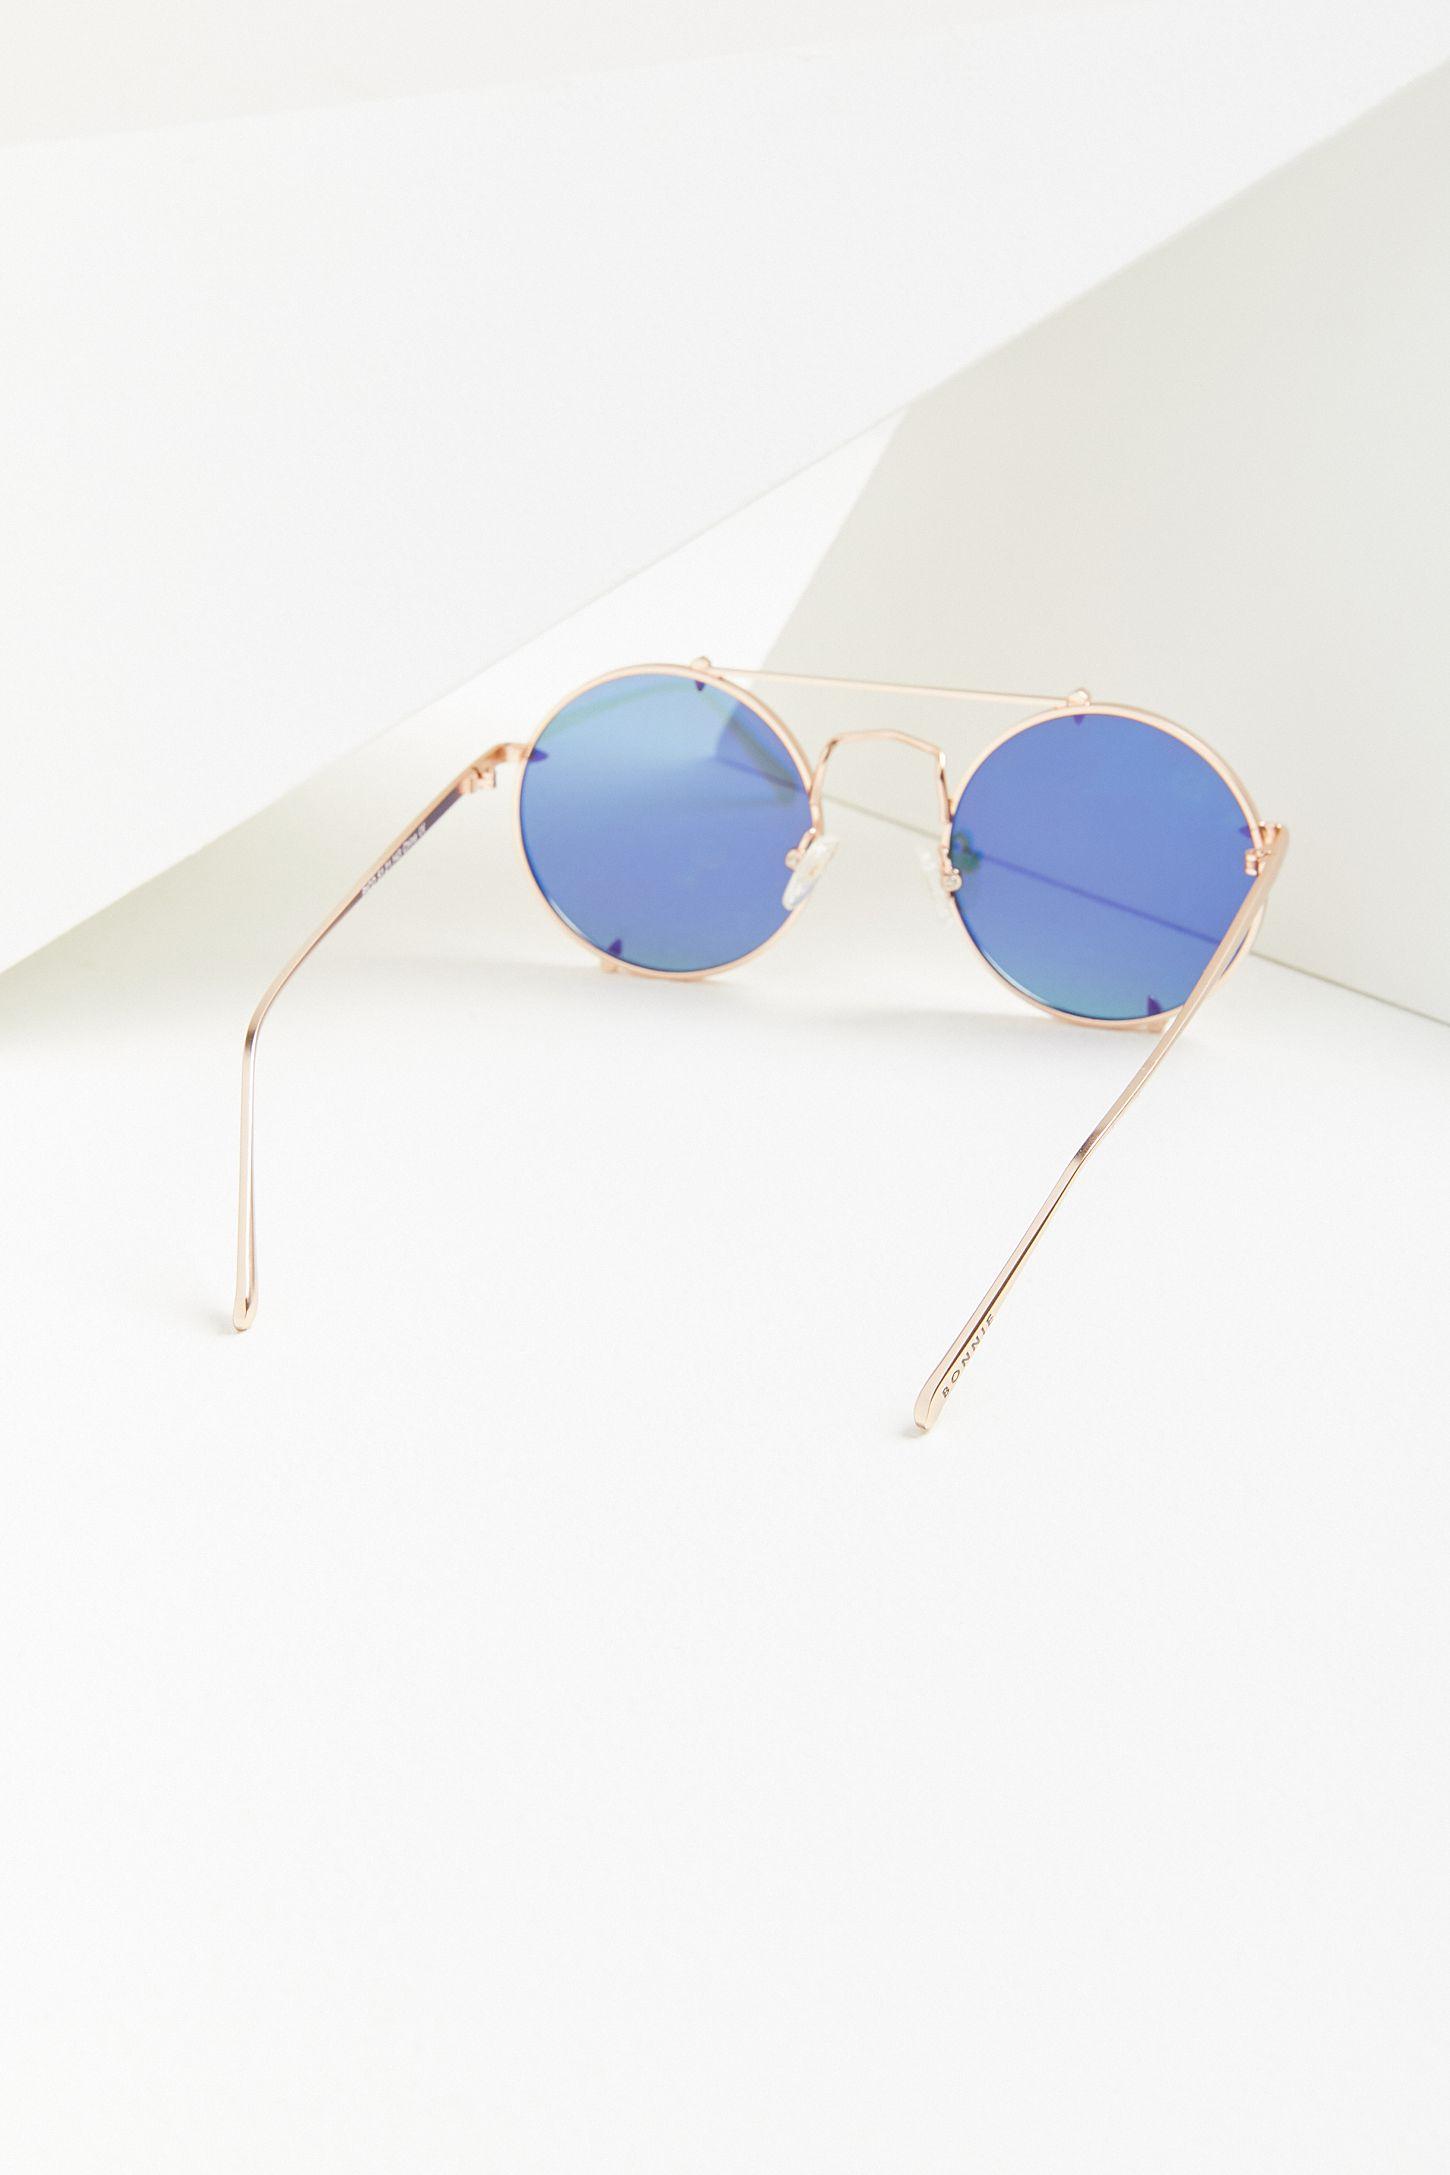 5dd161bc6db Slide View  3  Bonnie Clyde Pico Round Sunglasses